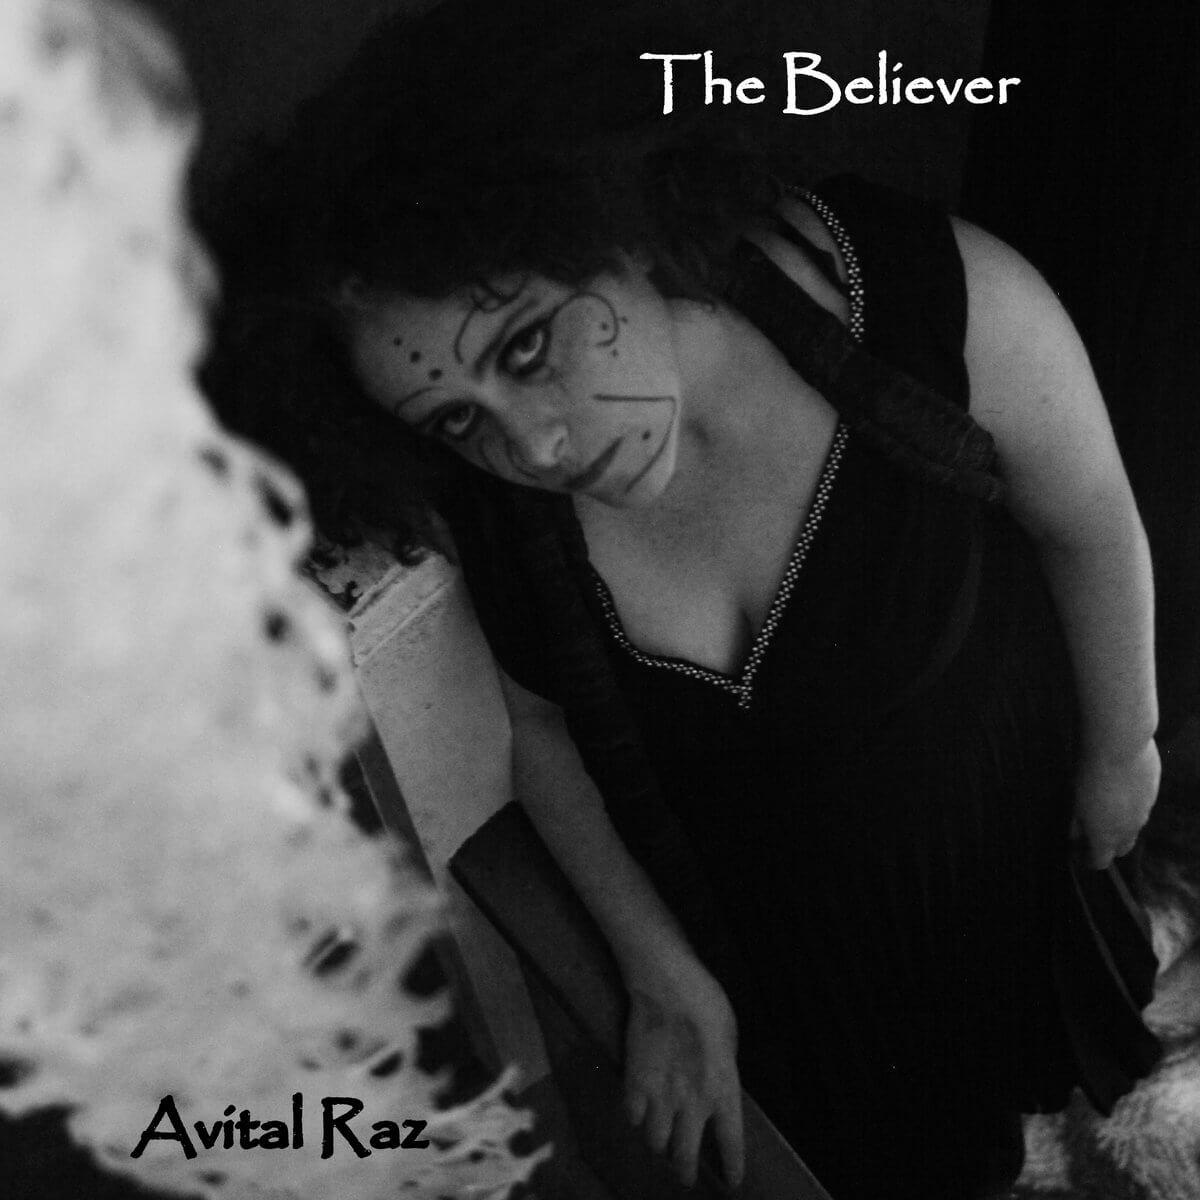 Avital Raz – The Believer Artwork